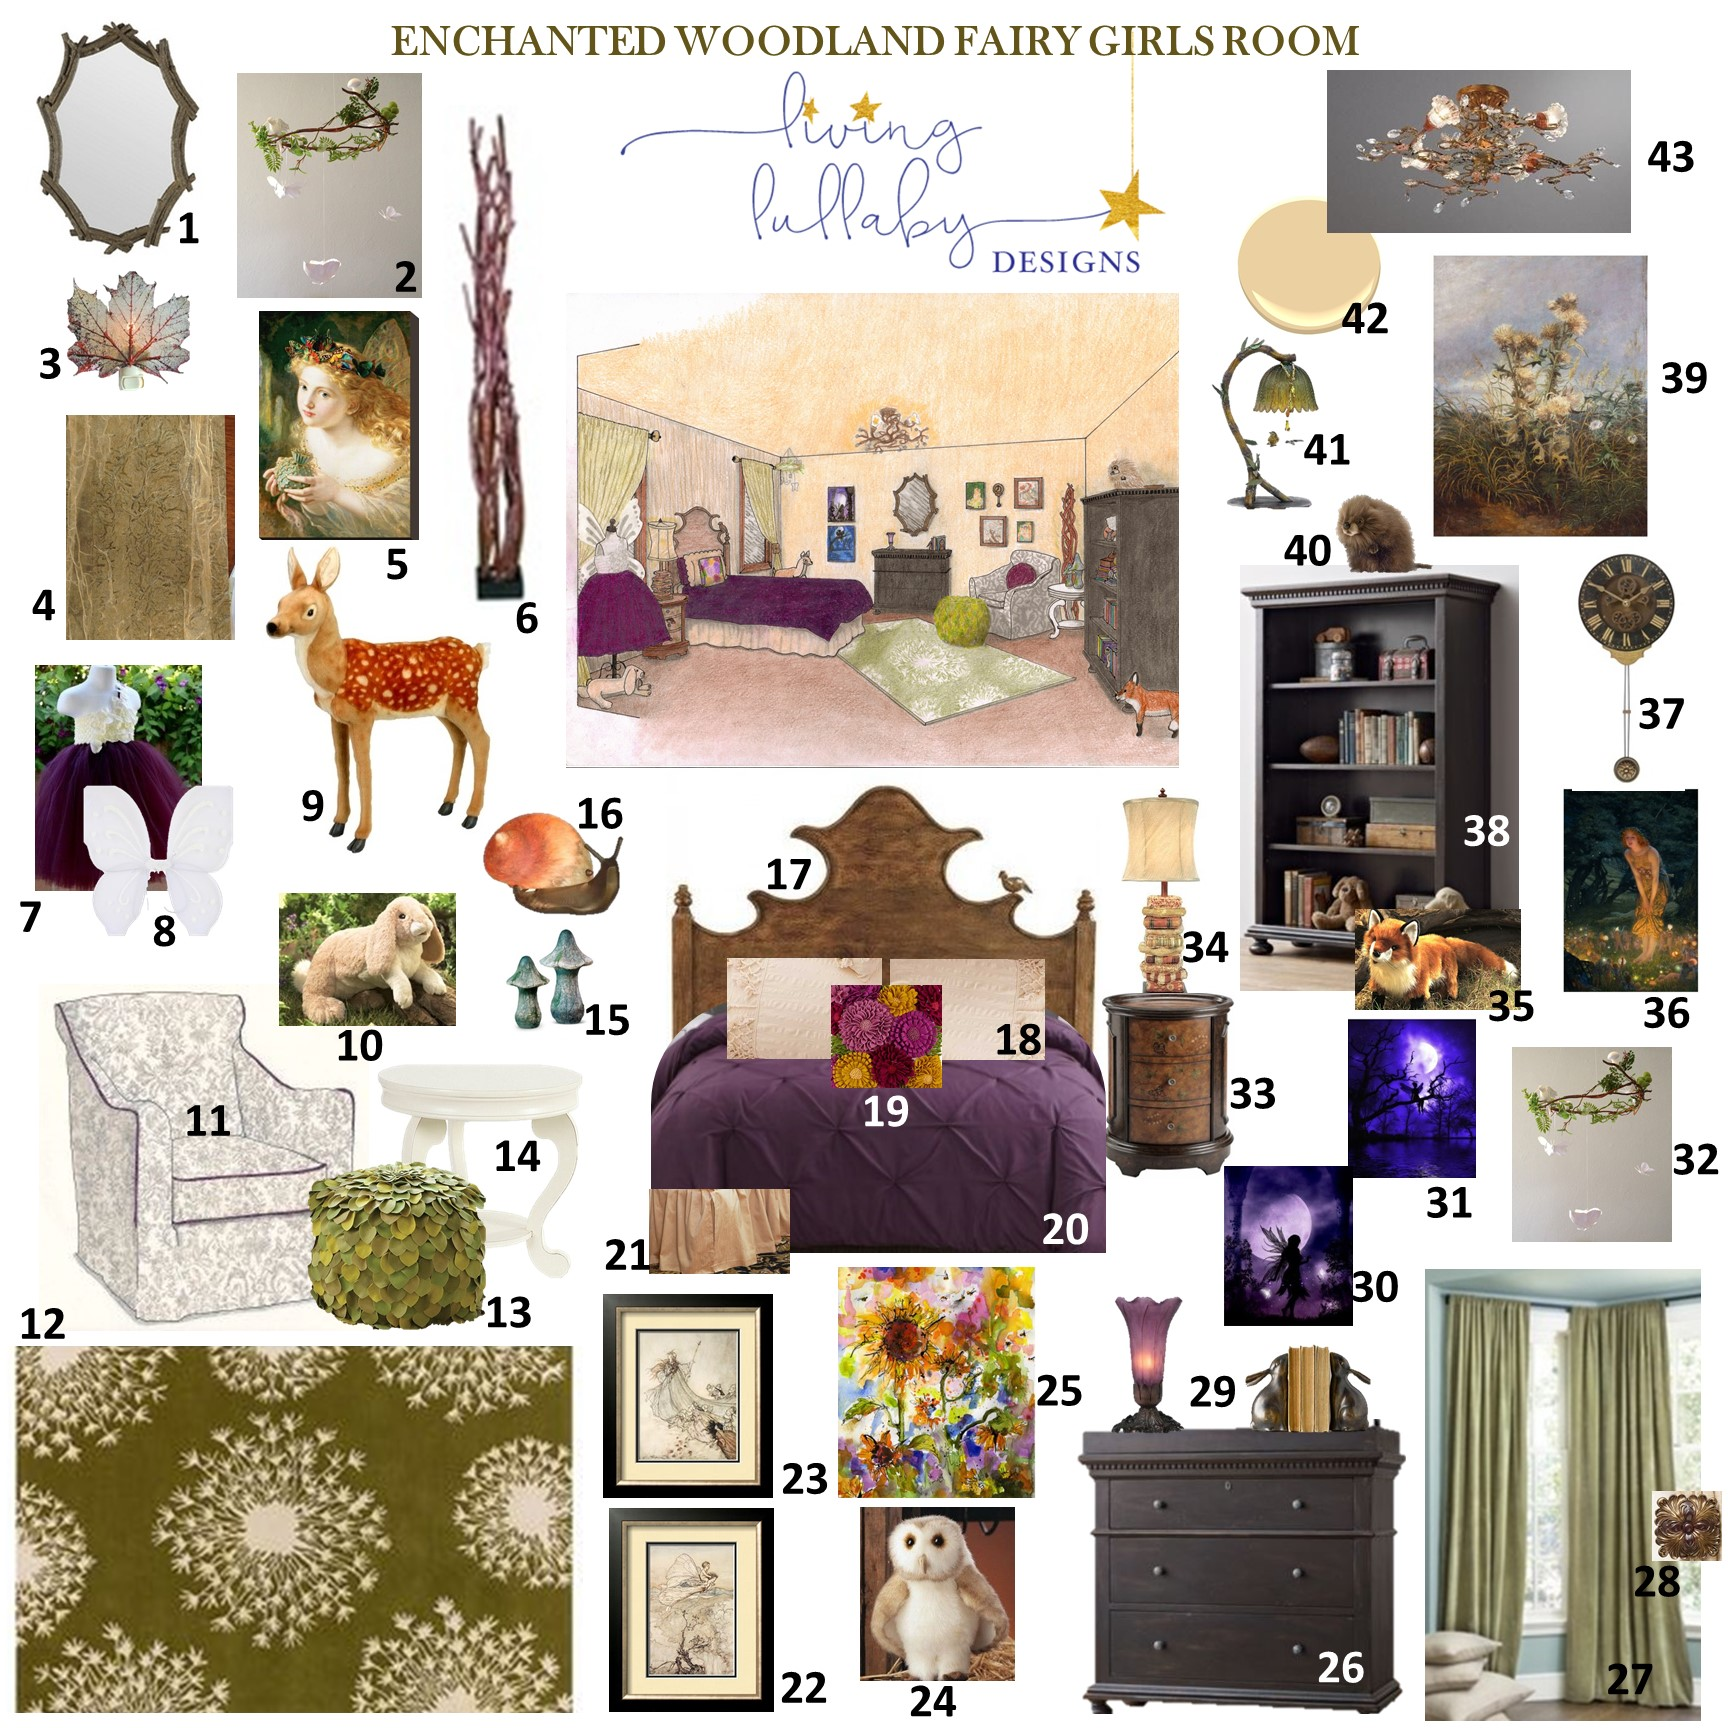 Penelope S Woodland Fairy Tale Nursery: Enchanted Woodland Fairy Girl's Room